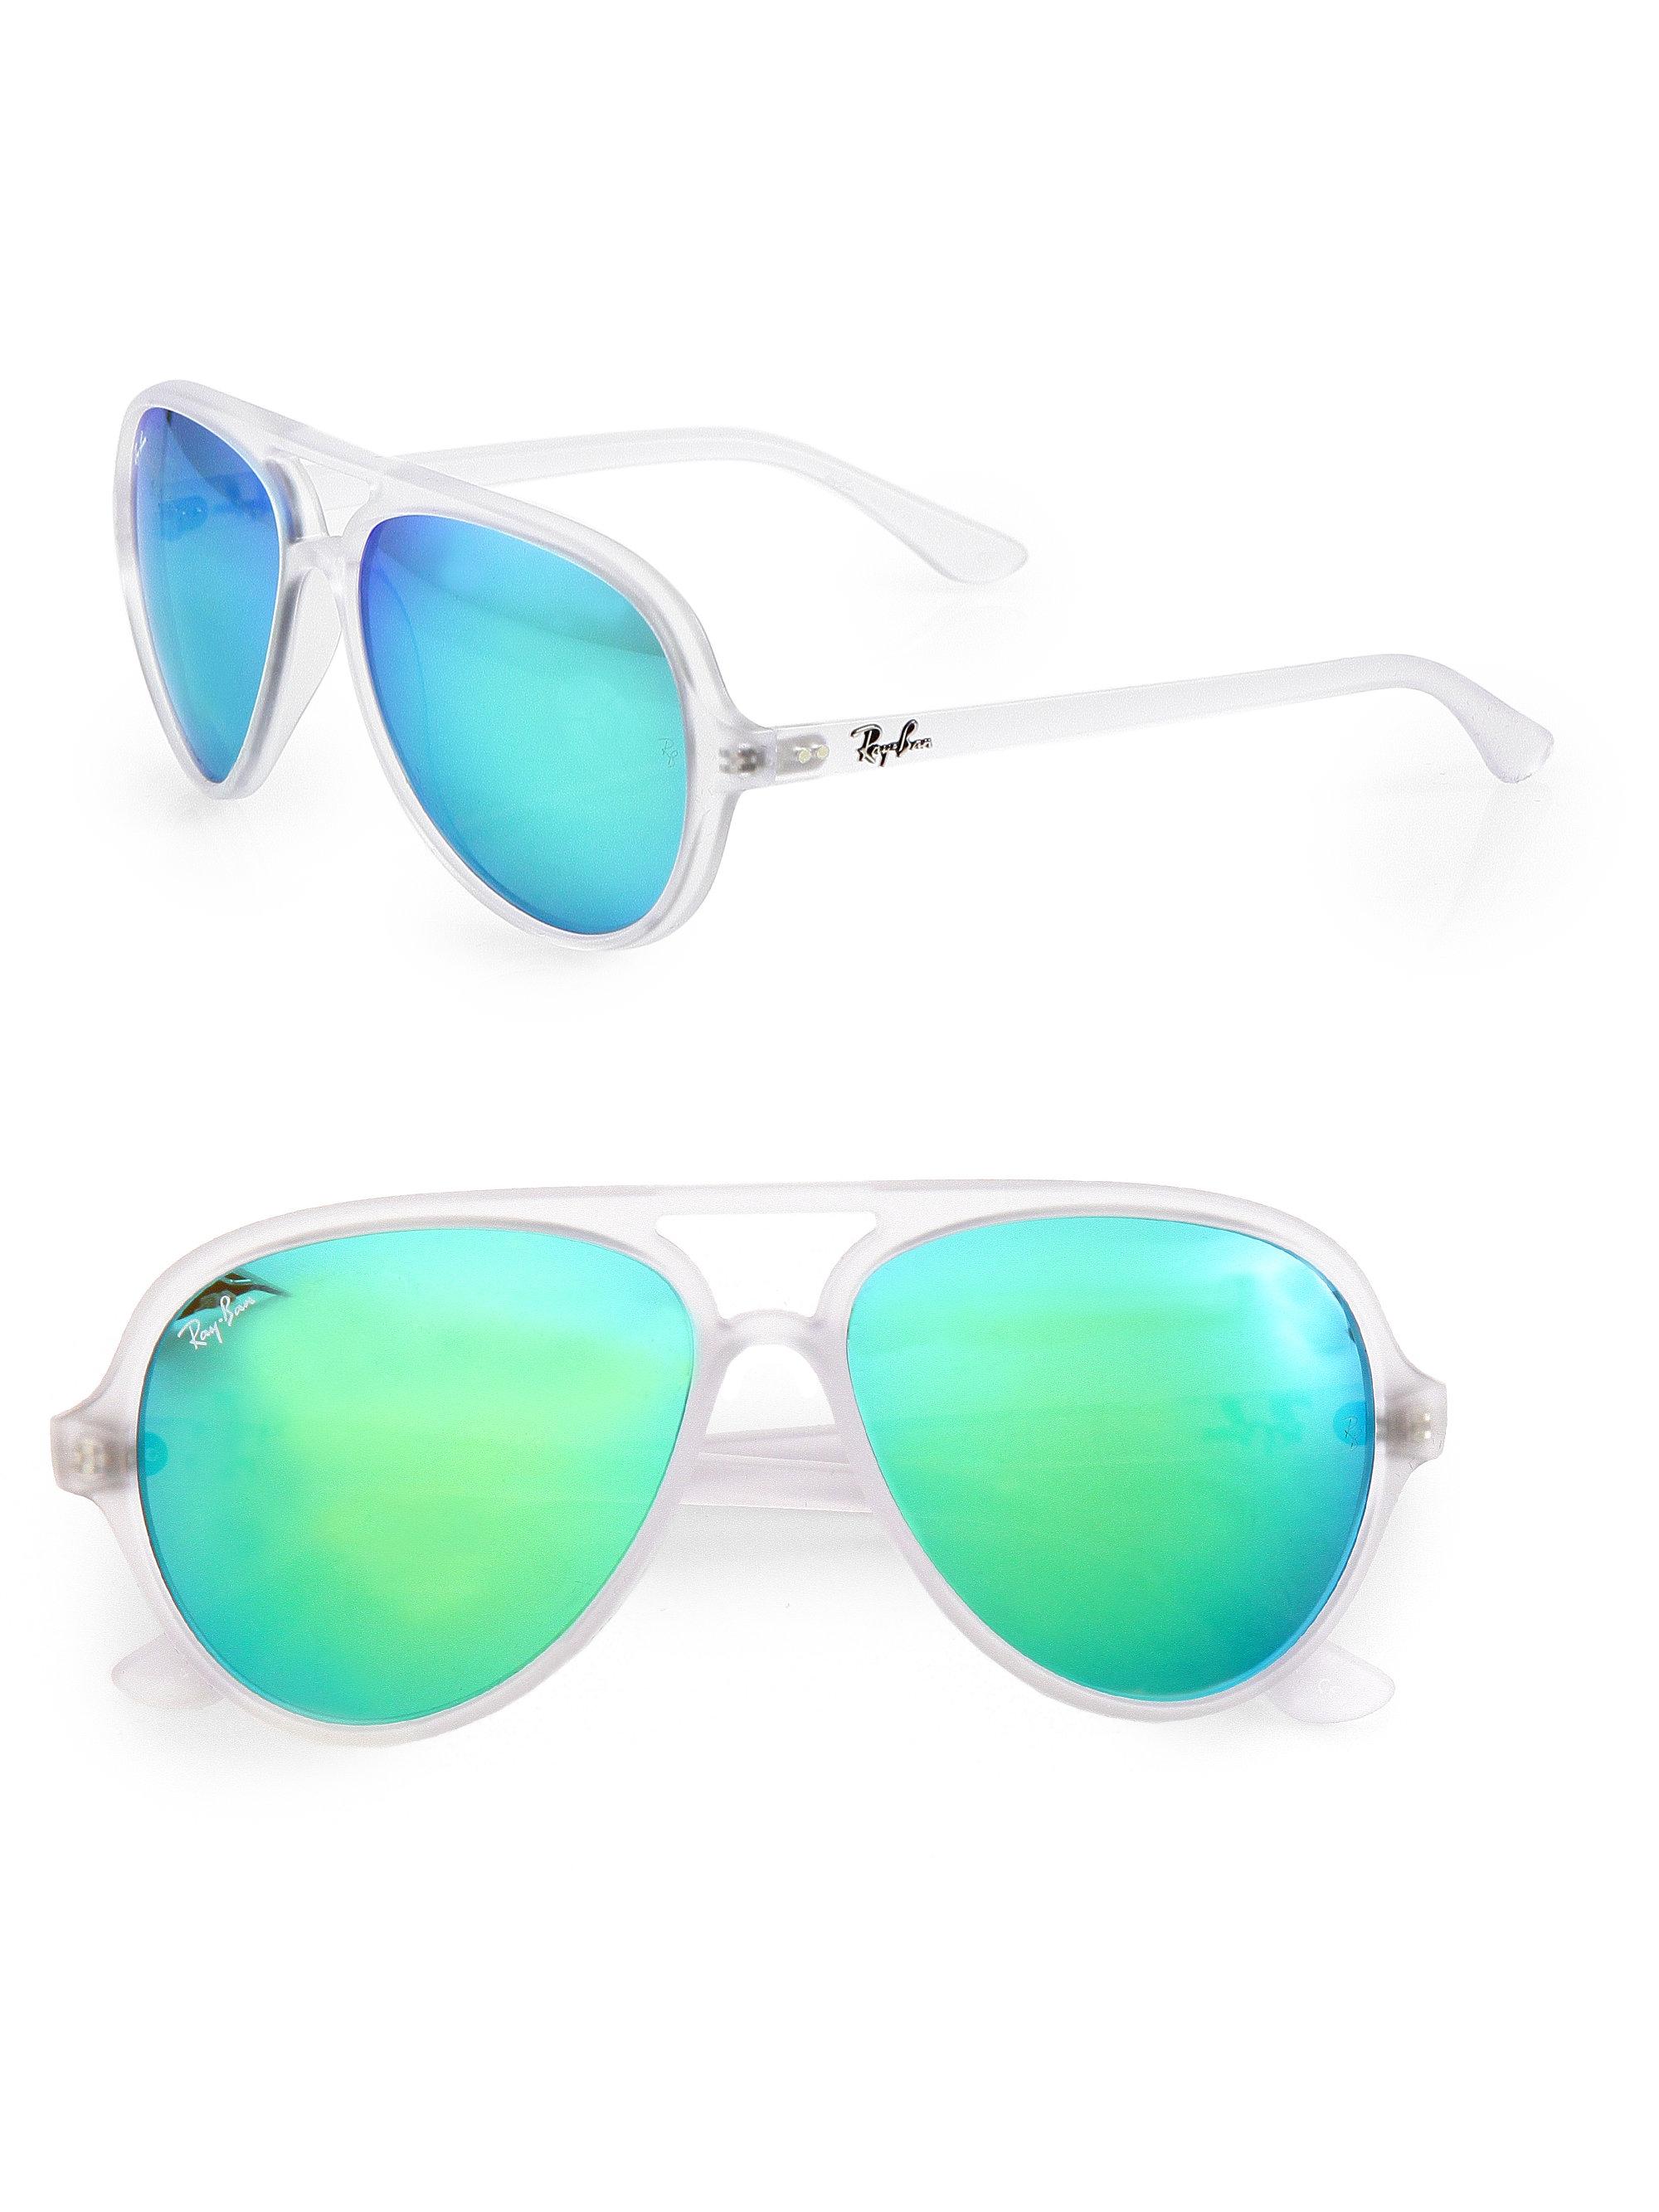 Rayban Sunglasses Blue  ray ban double bridge aviator sunglasses in blue for men lyst